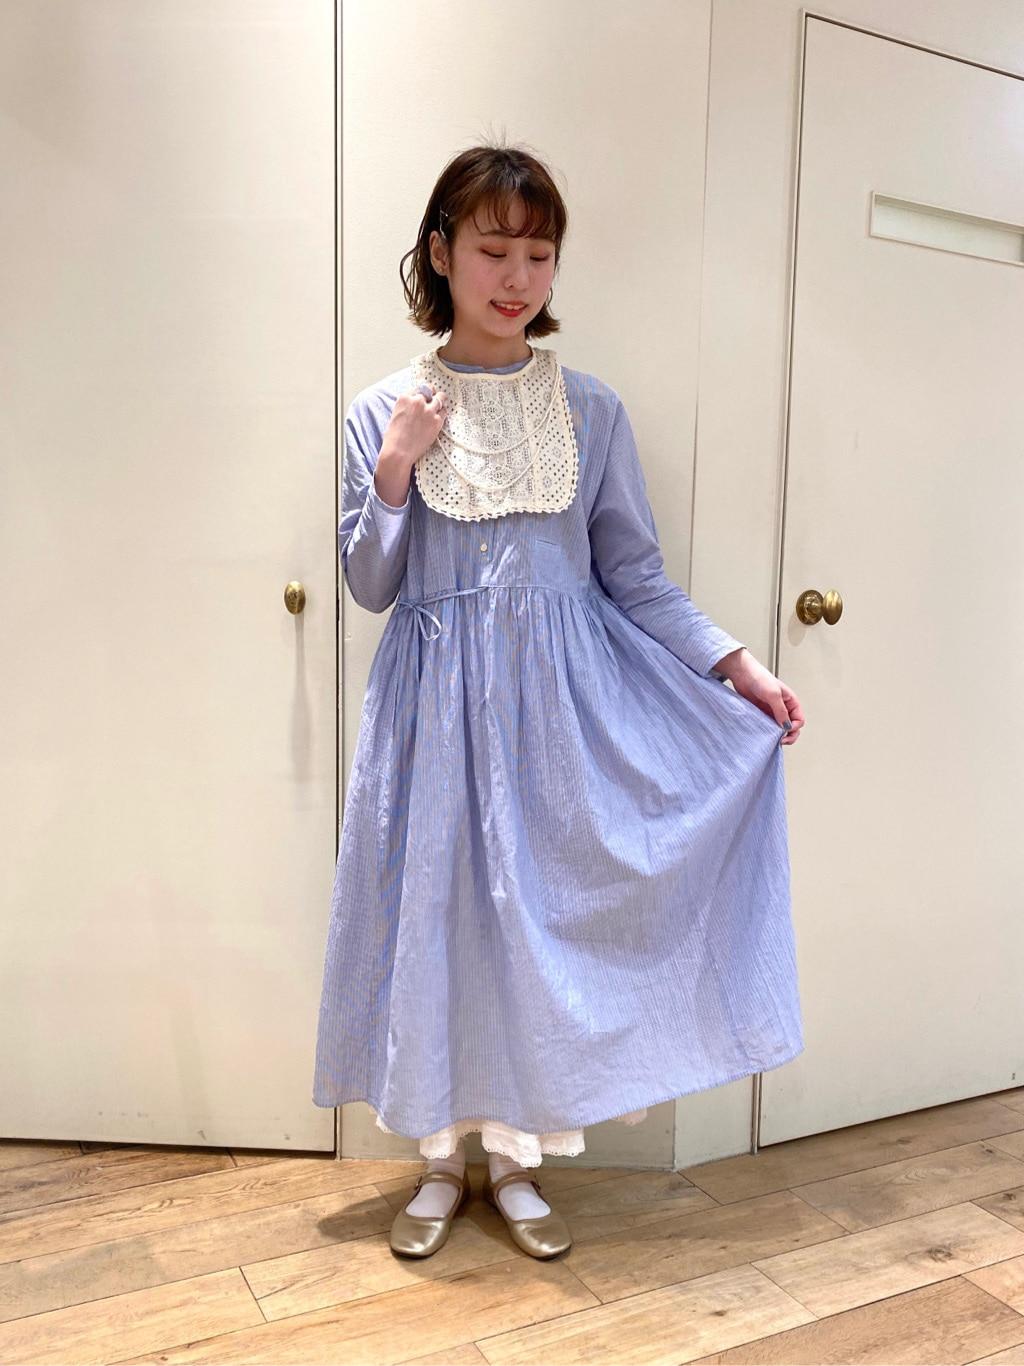 bulle de savon 新宿ミロード 身長:157cm 2021.03.26